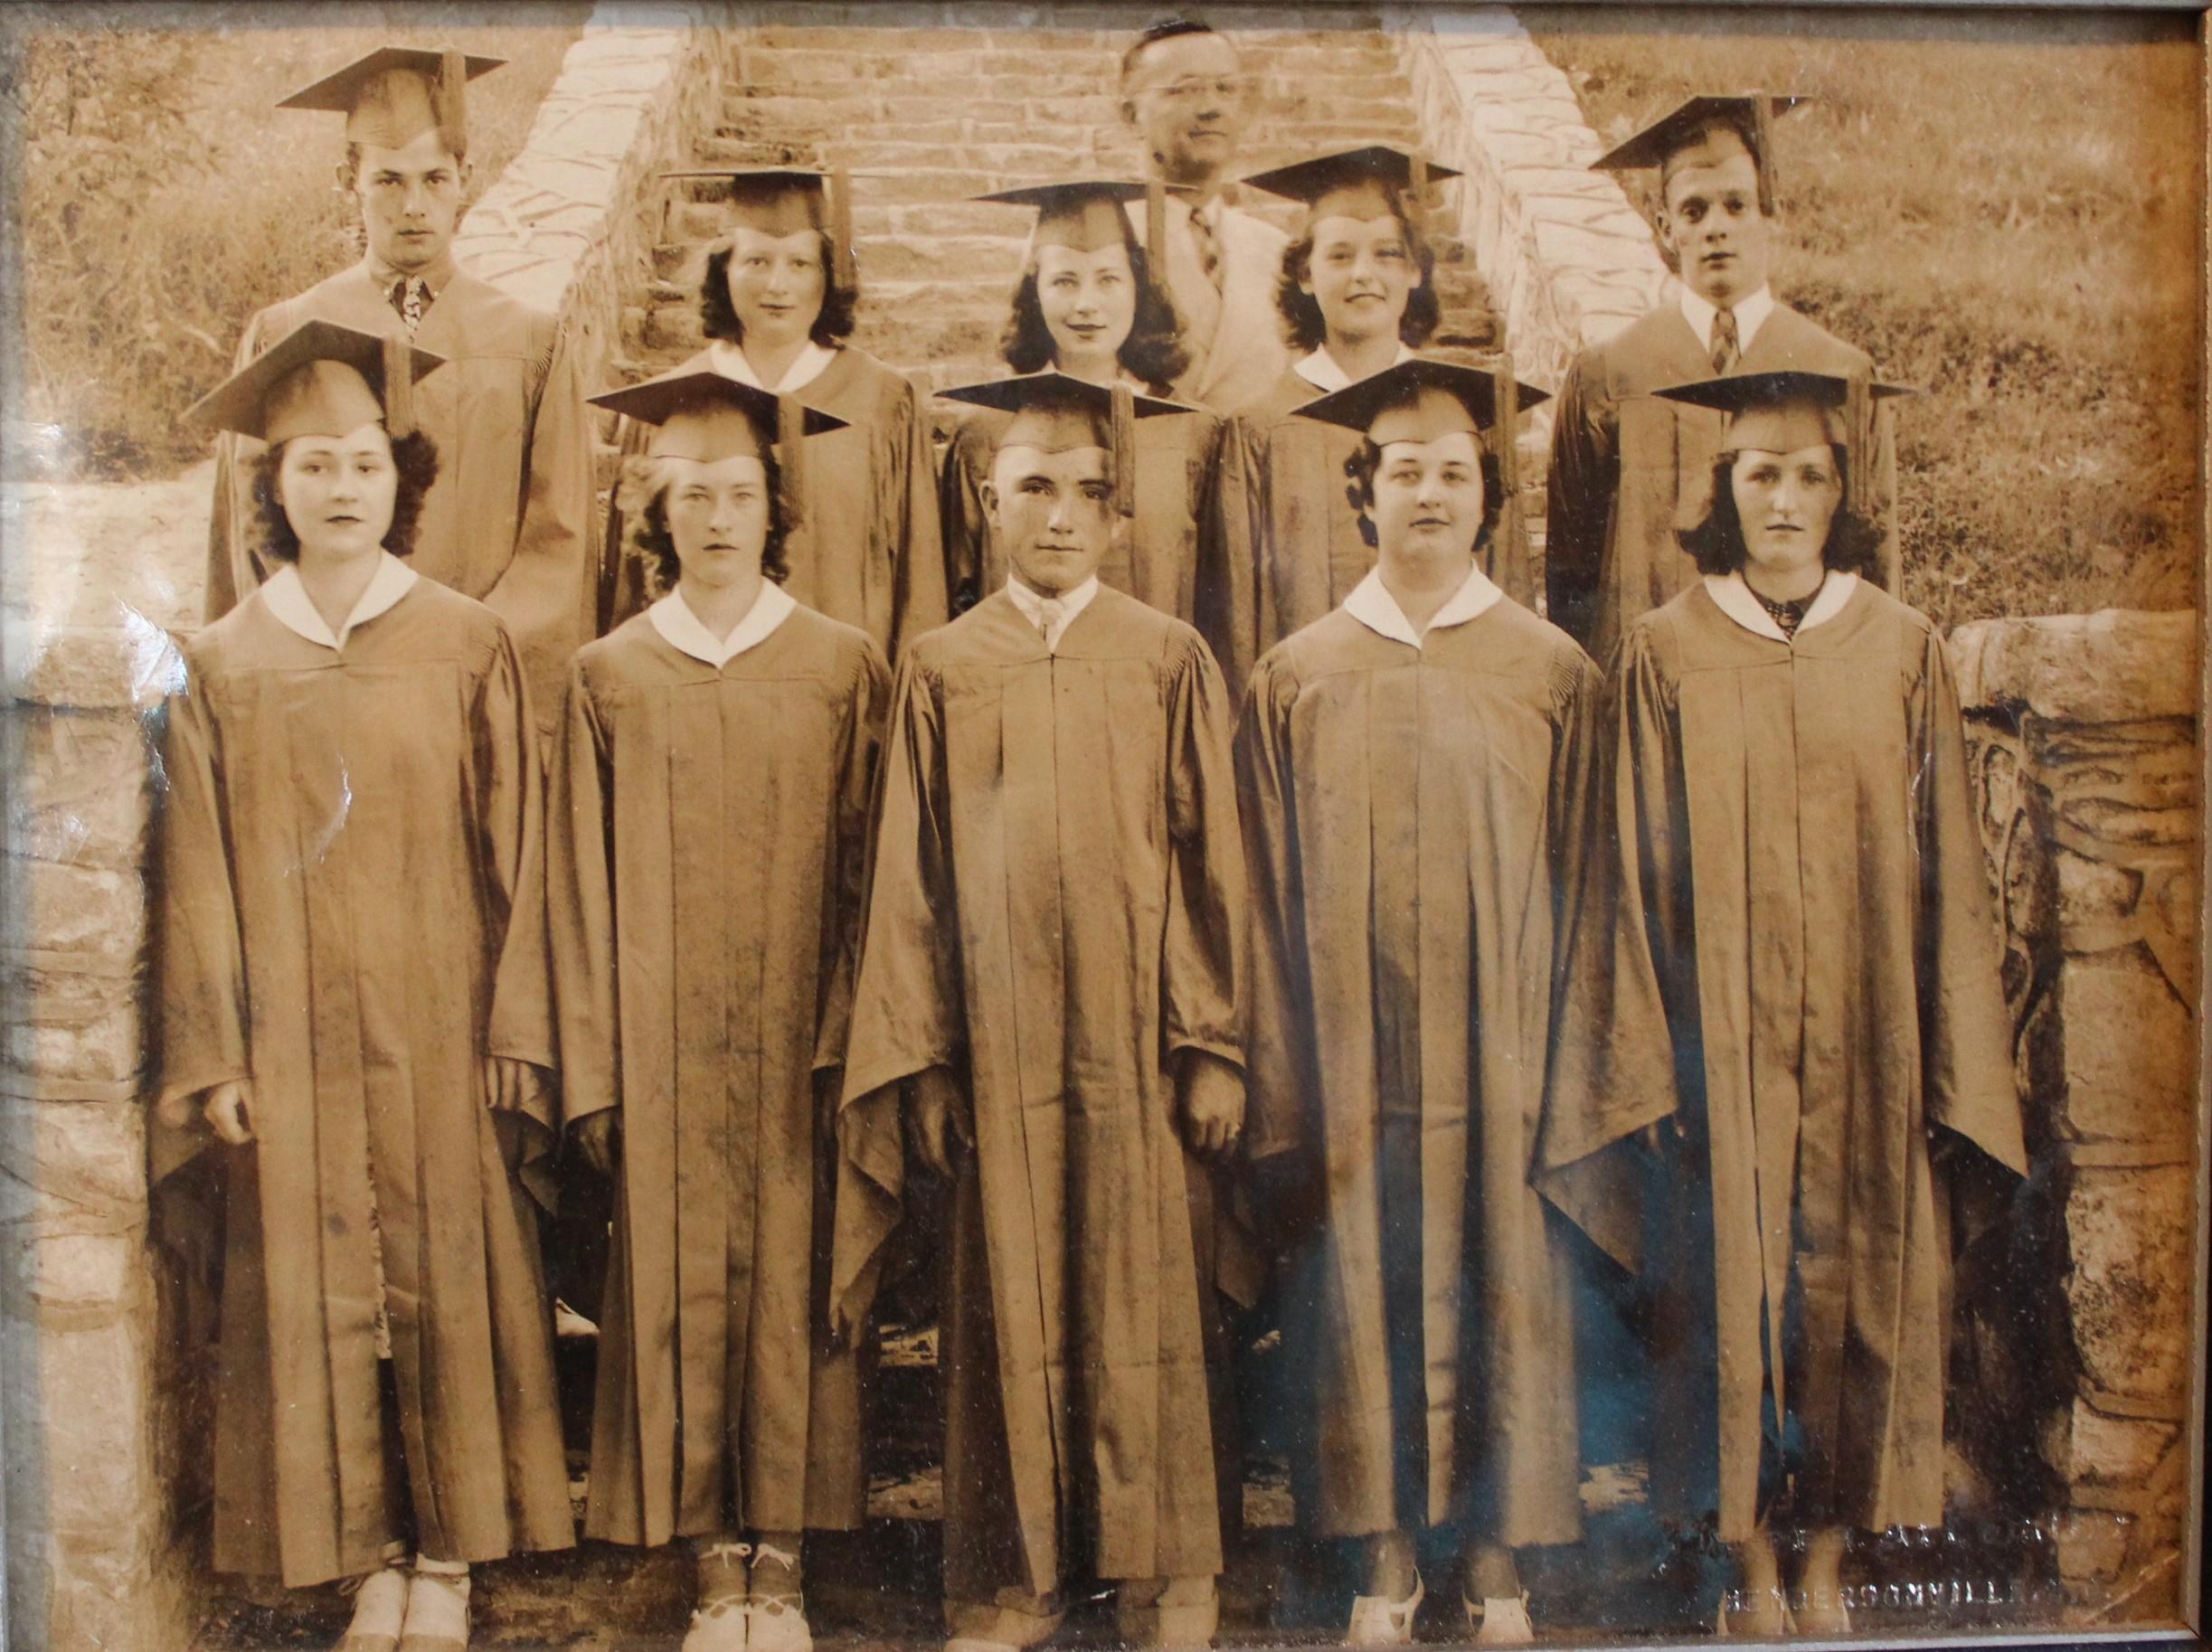 Saluda School Class of 1939